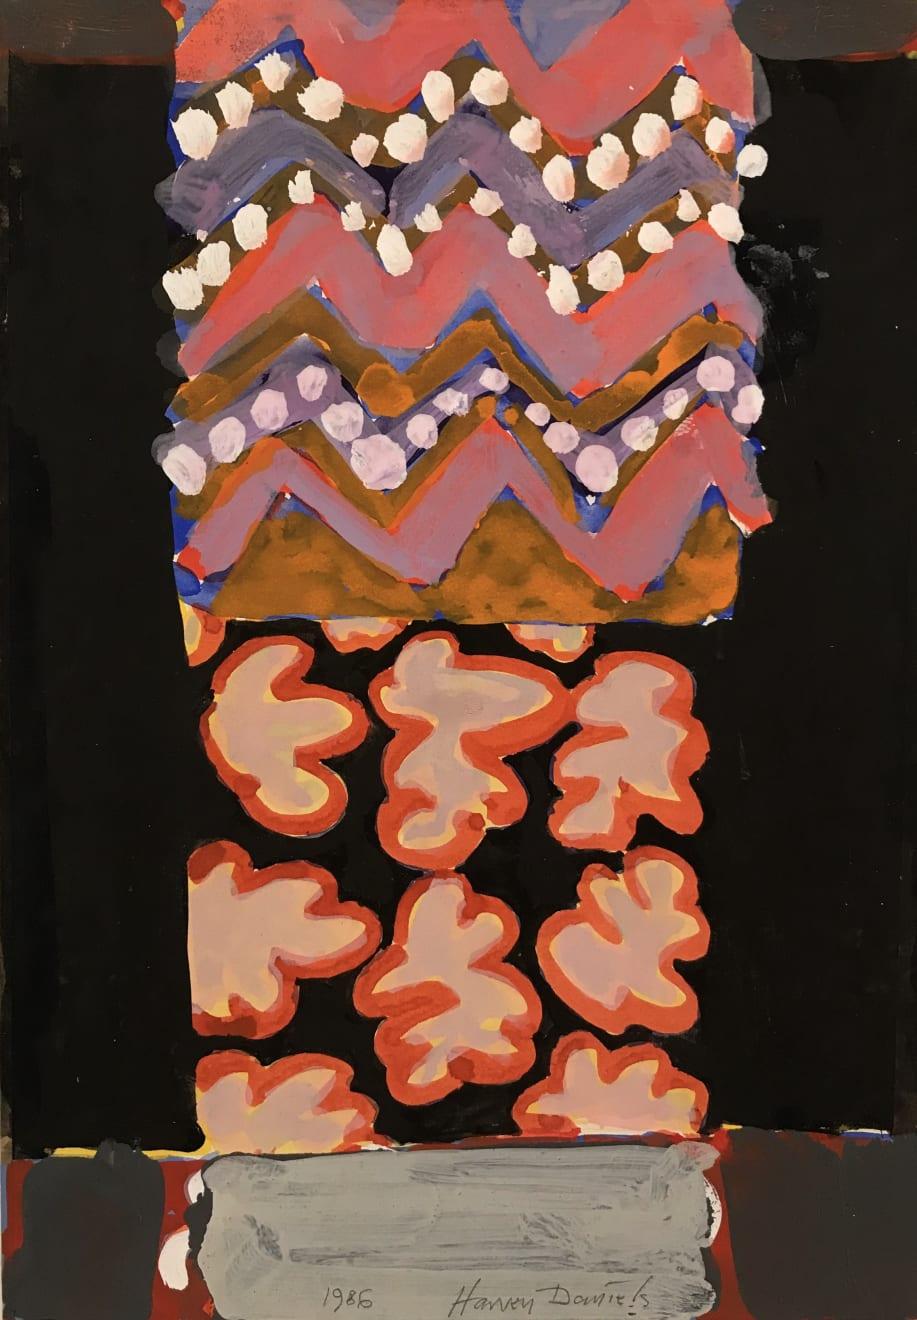 Harvey Daniels, Untitled, 1986